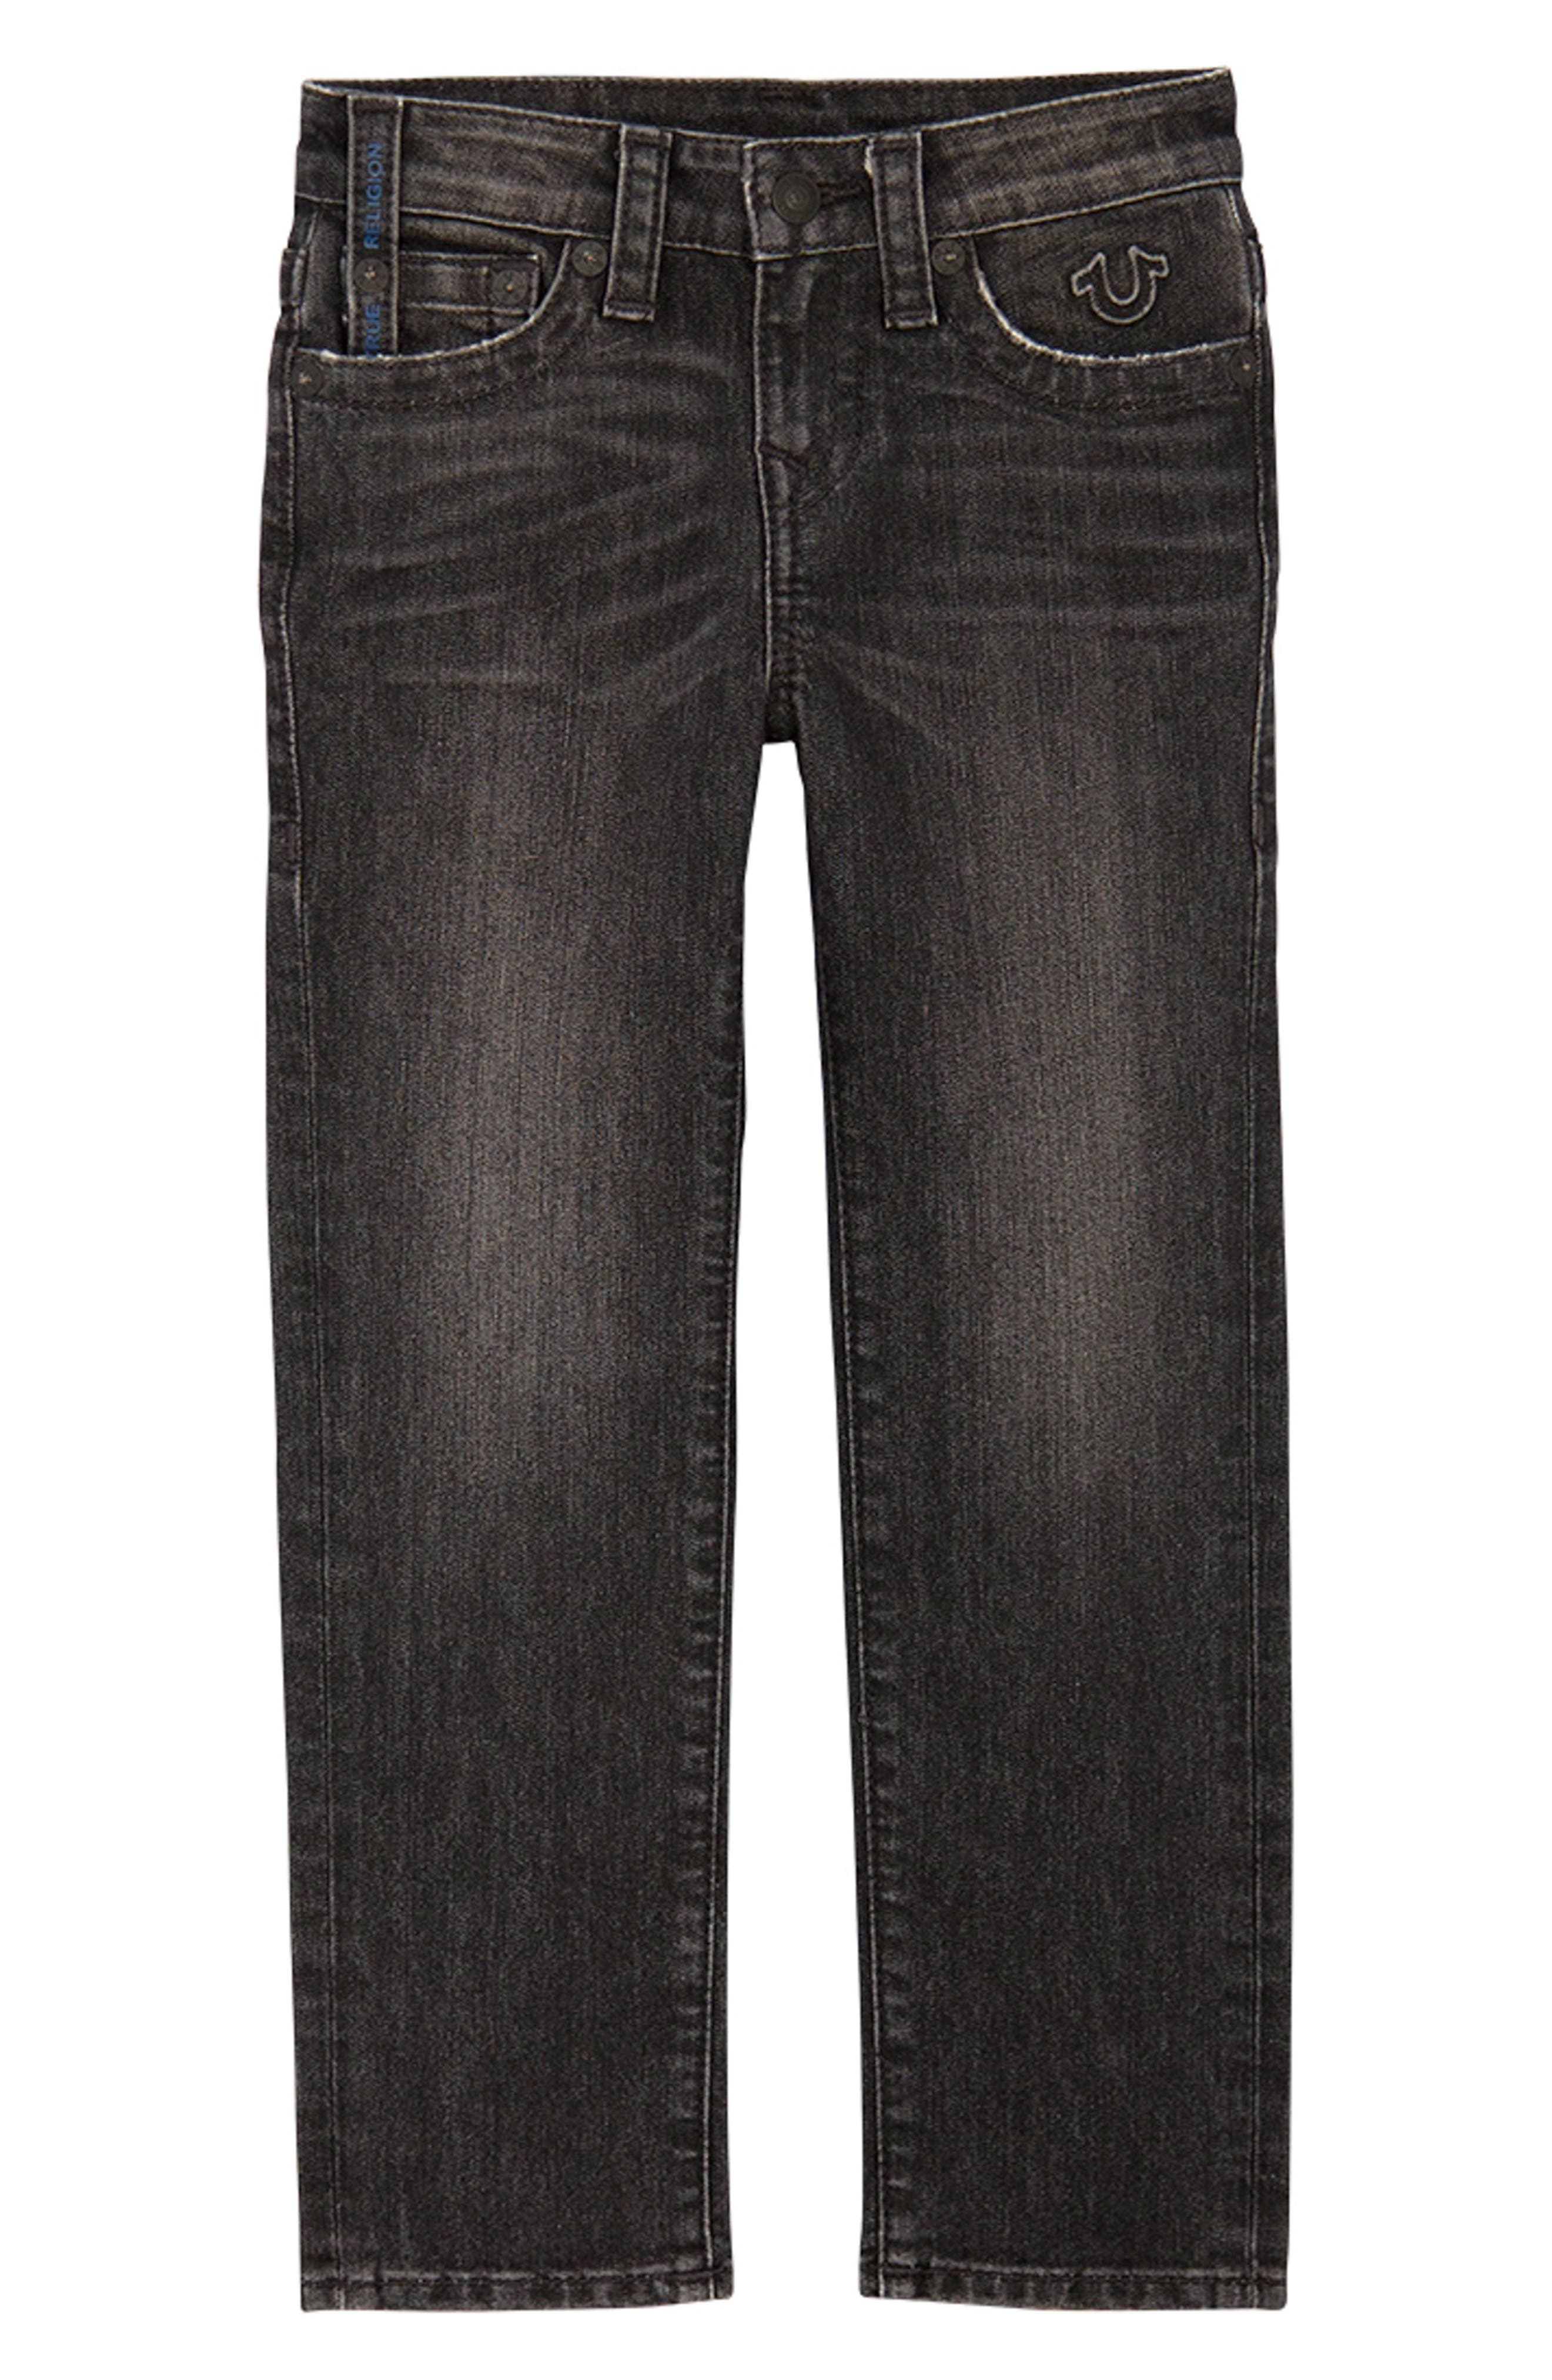 Geno Straight Leg Jeans,                             Main thumbnail 1, color,                             GRANITE WASH